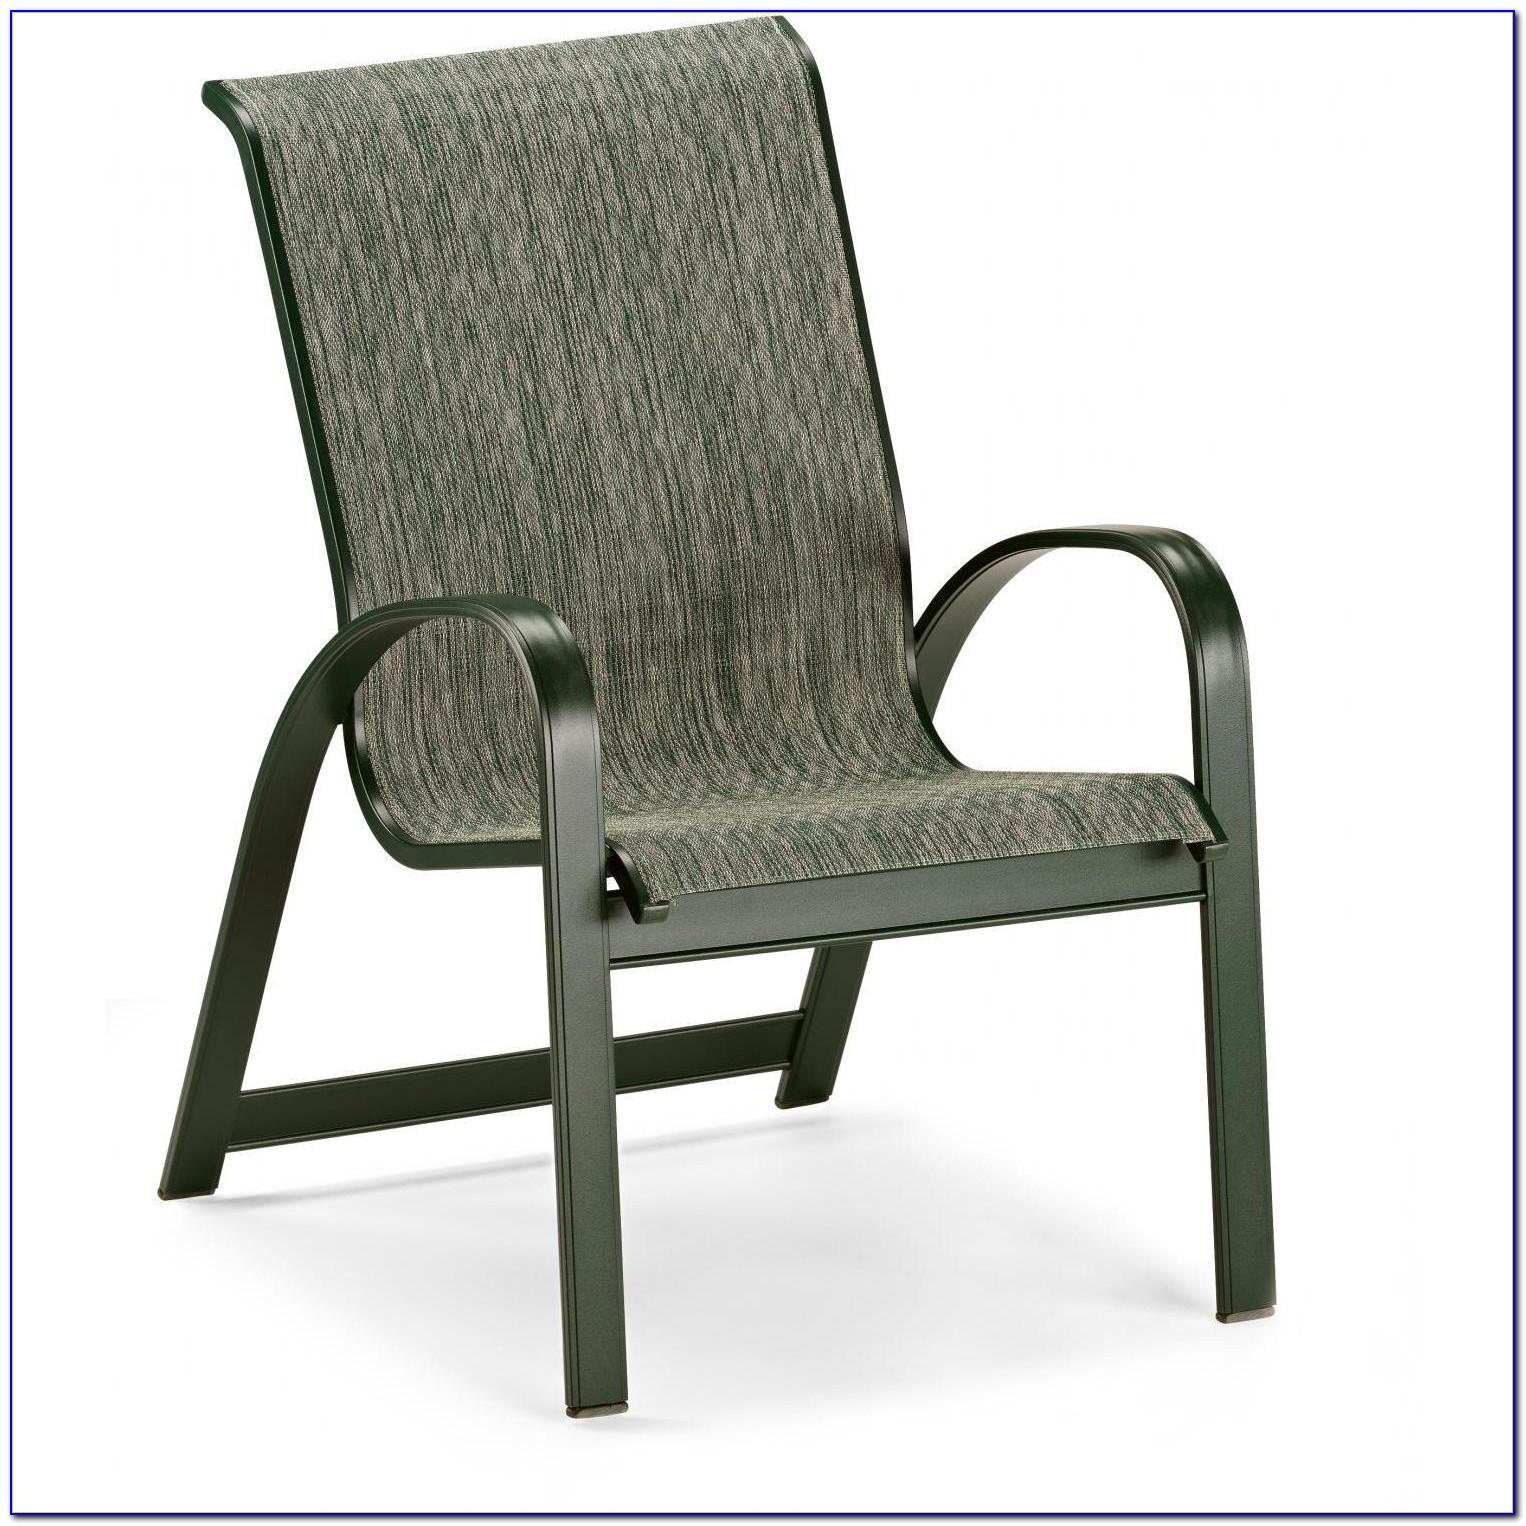 Sling Patio Chair Fabric